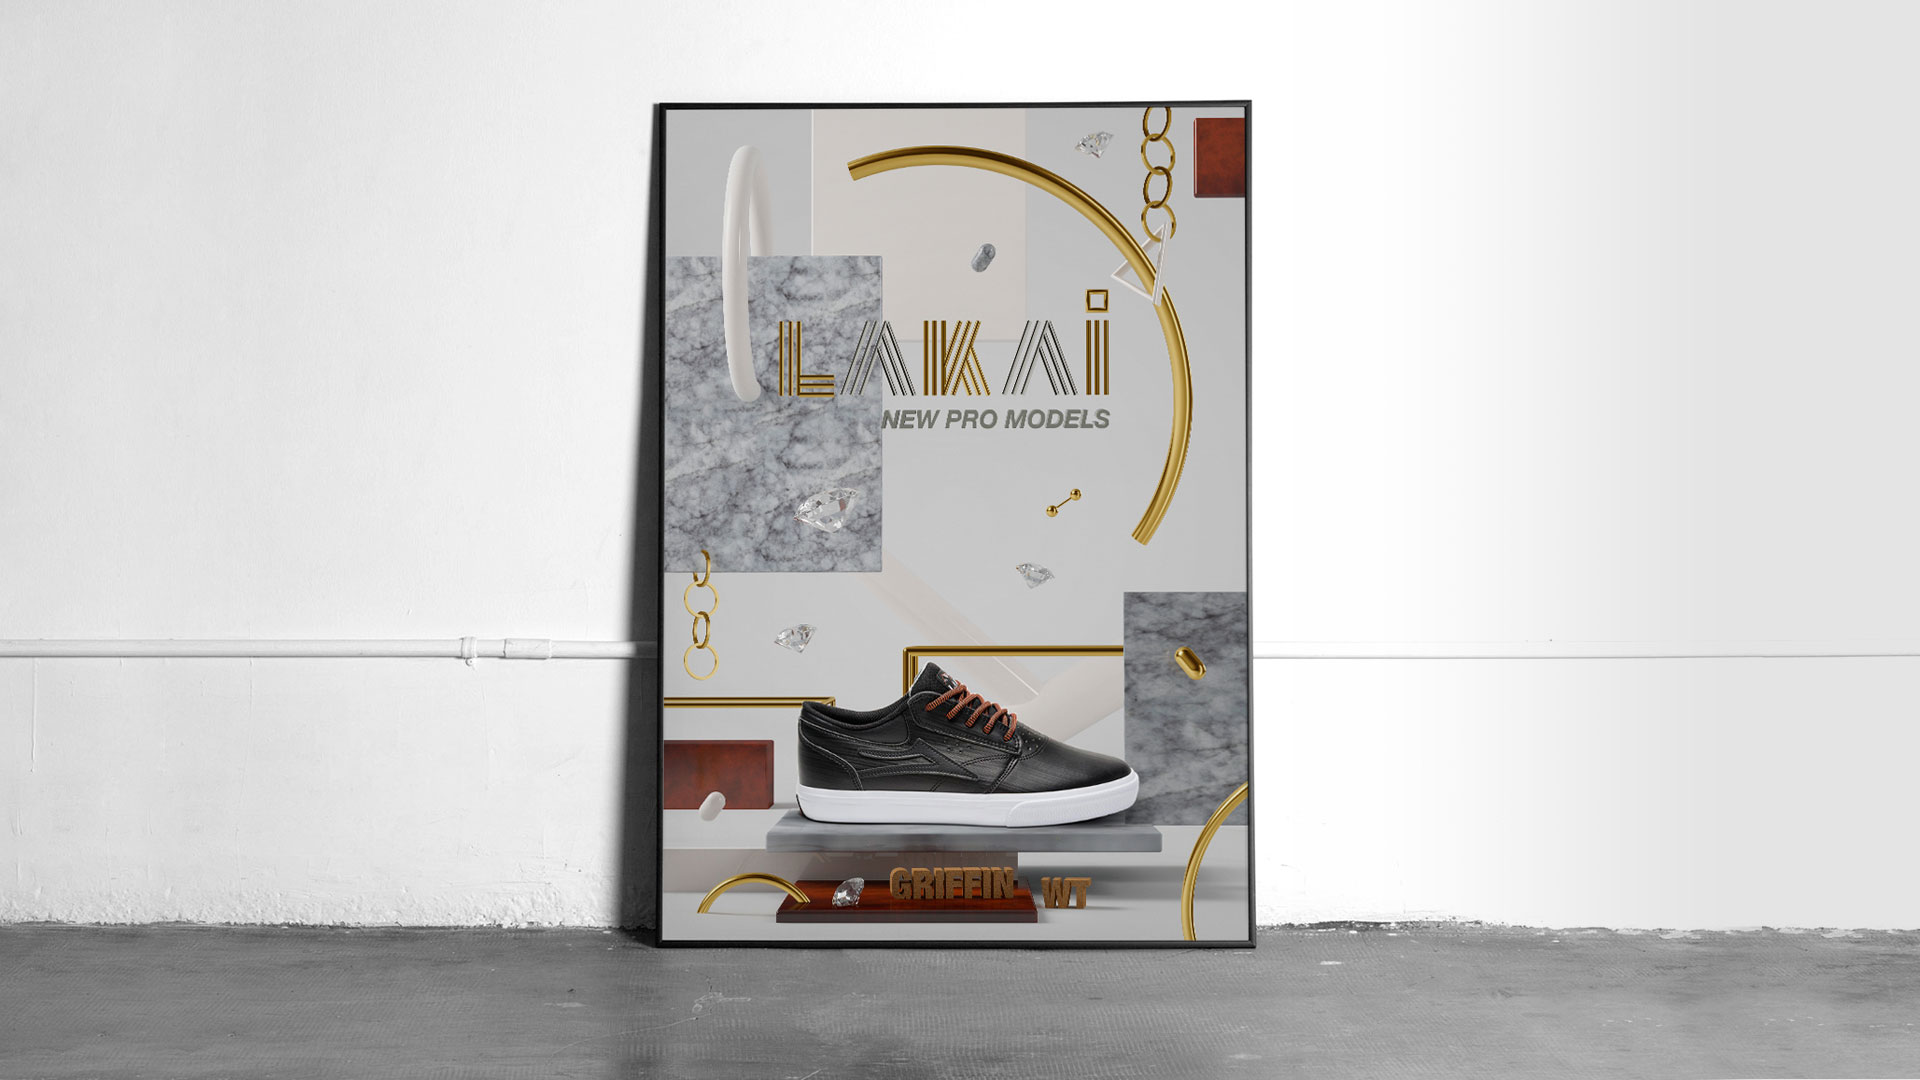 advertising_lakai_shoes_artdirection_cover